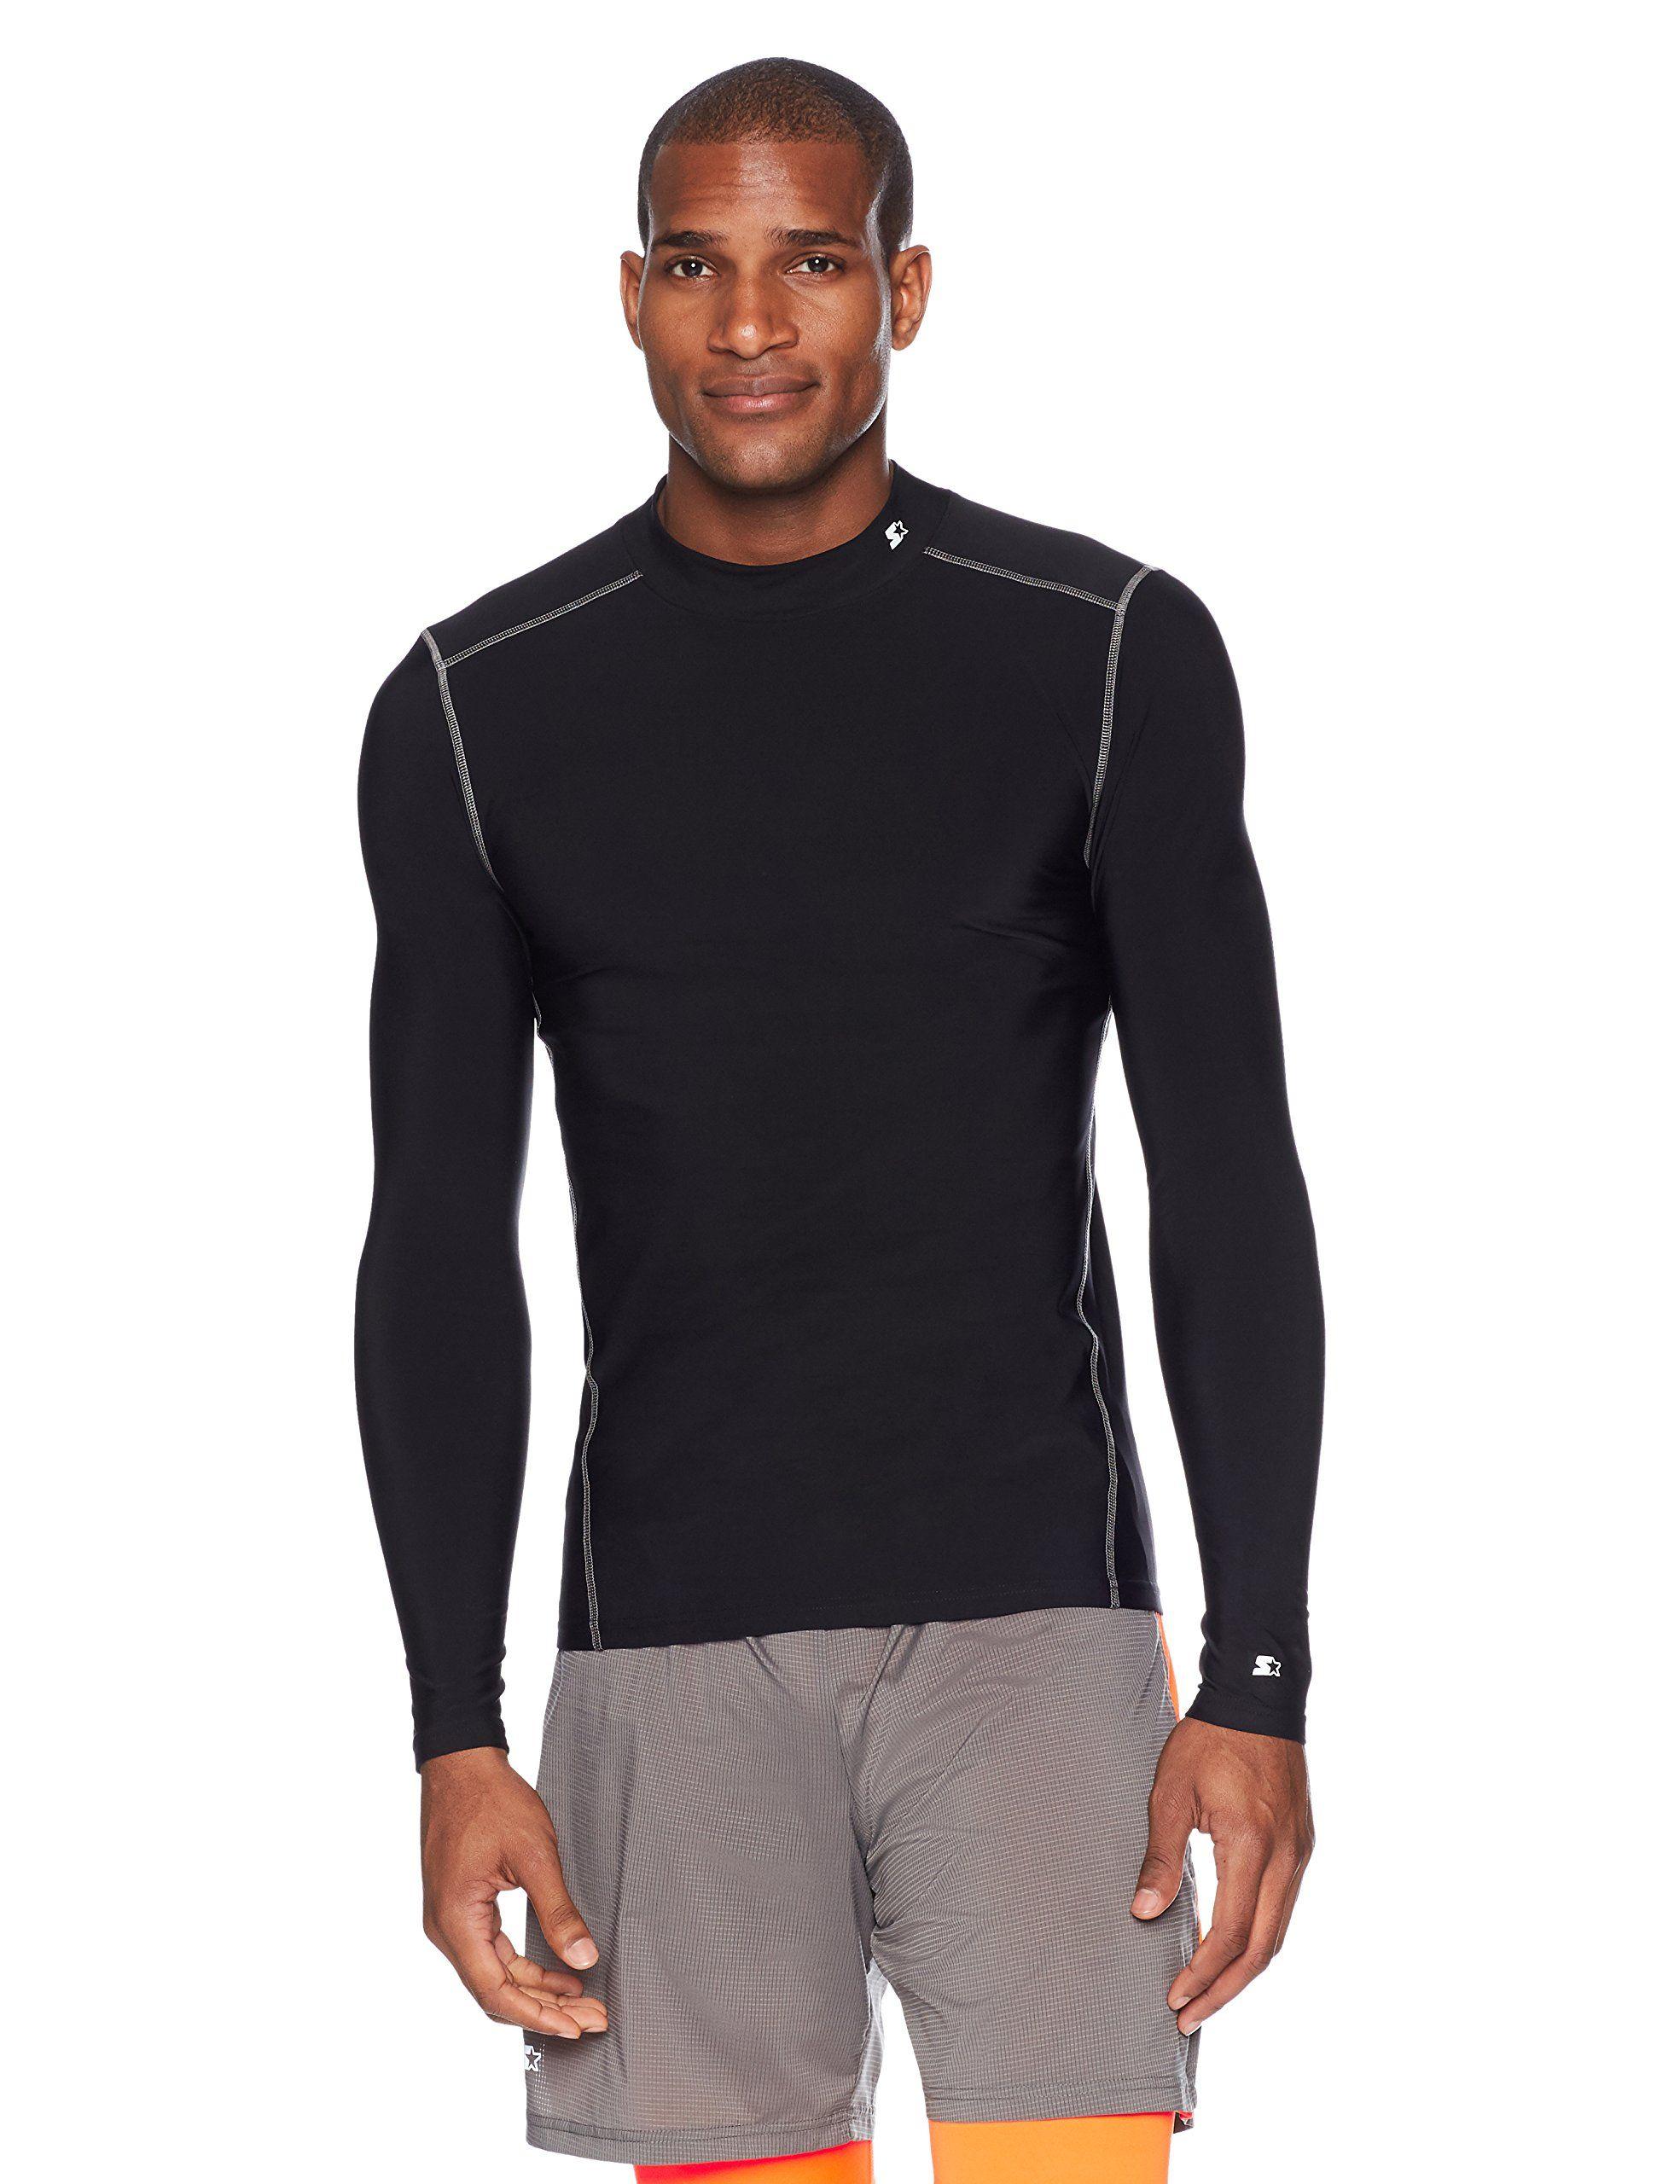 Exclusive Starter Mens Long Sleeve Mock Neck Athletic Light-Compression T-Shirt